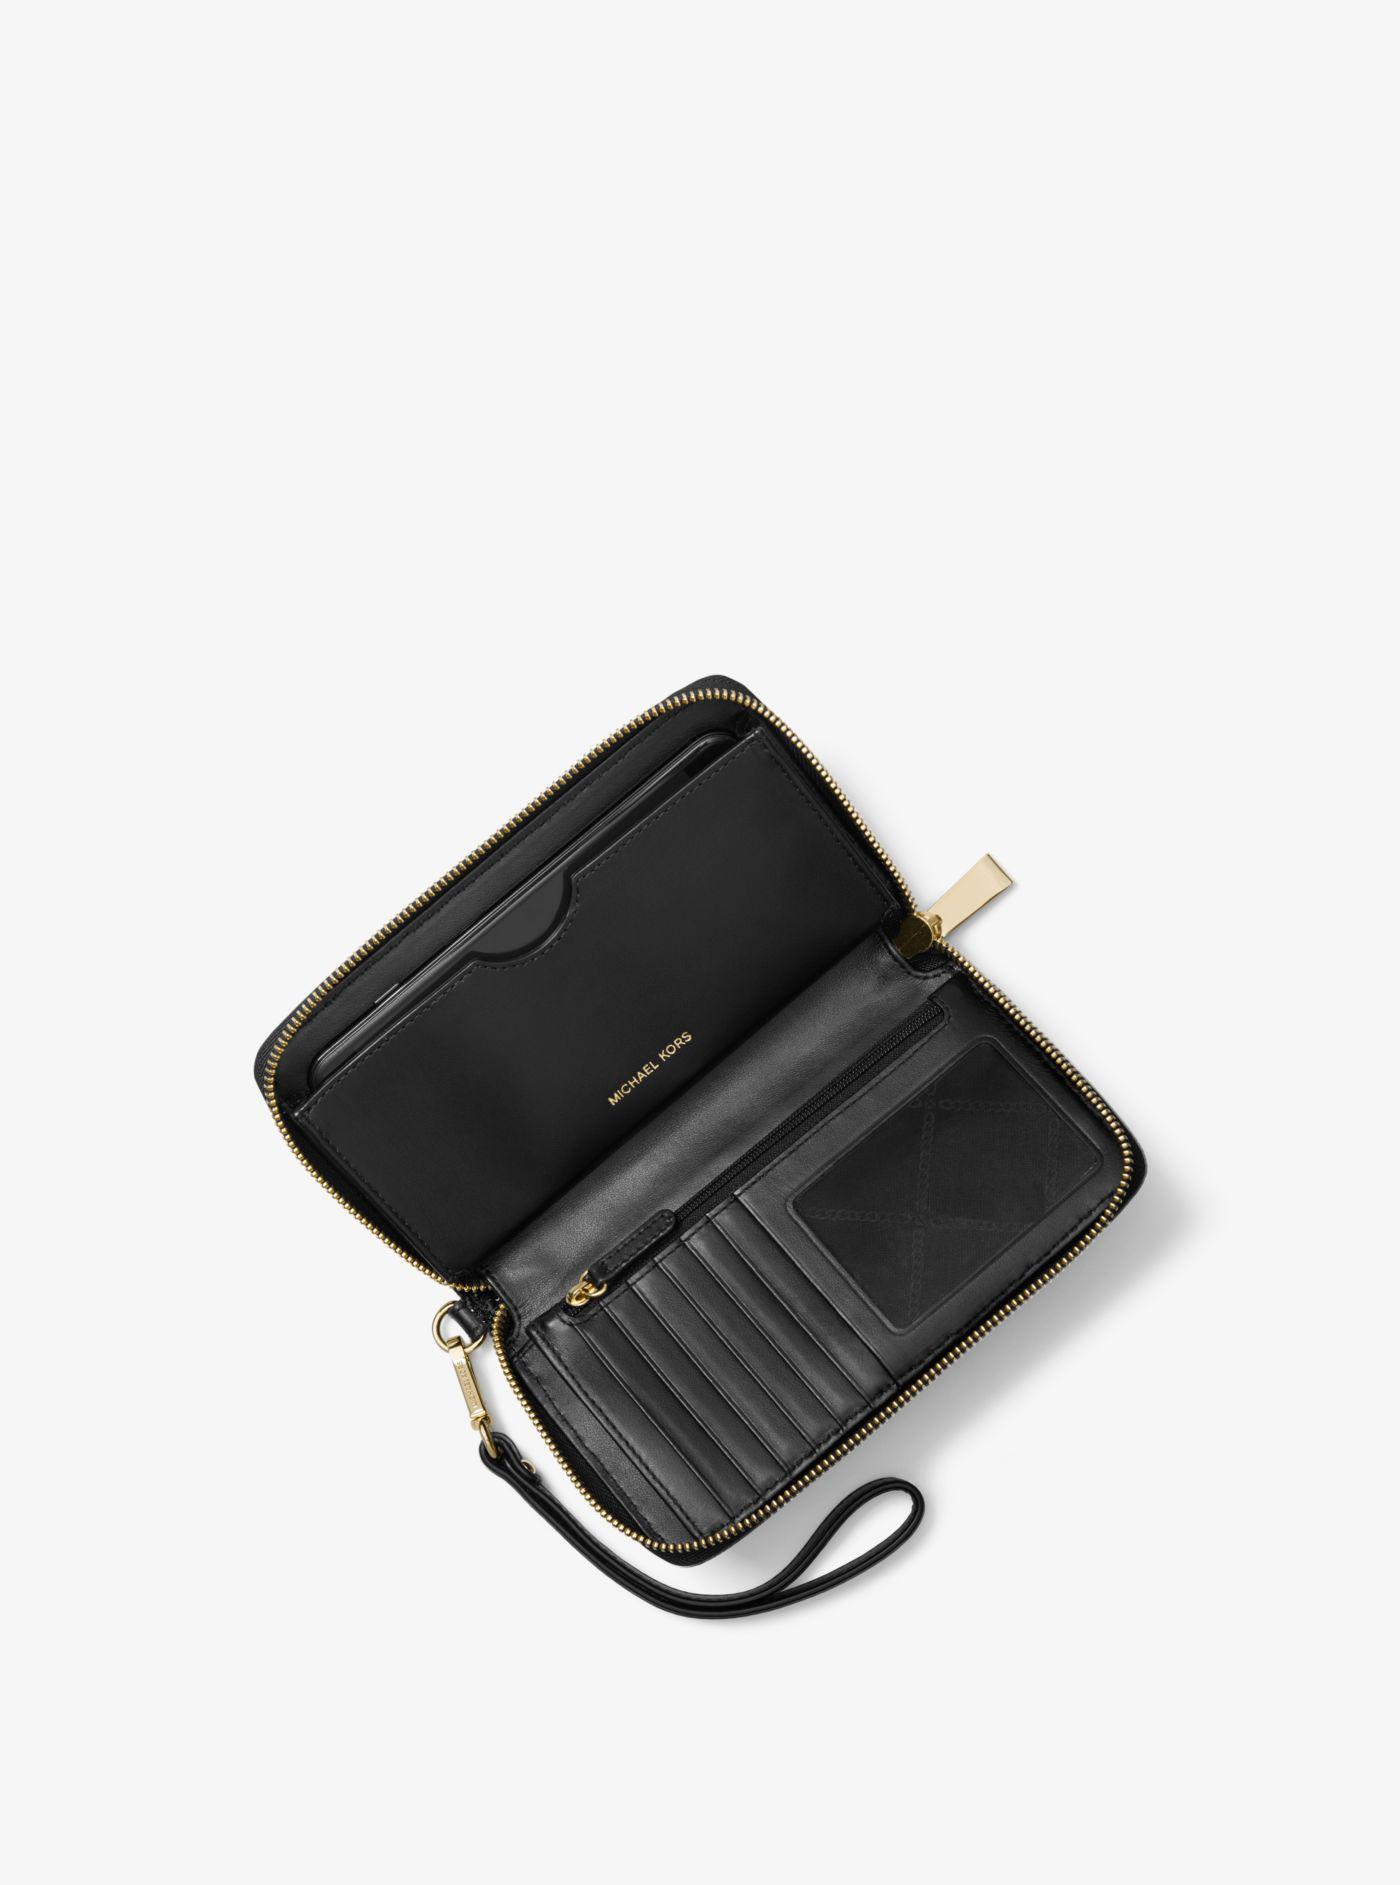 c4322393eb1c6c Michael Kors Large Glitter Smartphone Wristlet in Black - Lyst